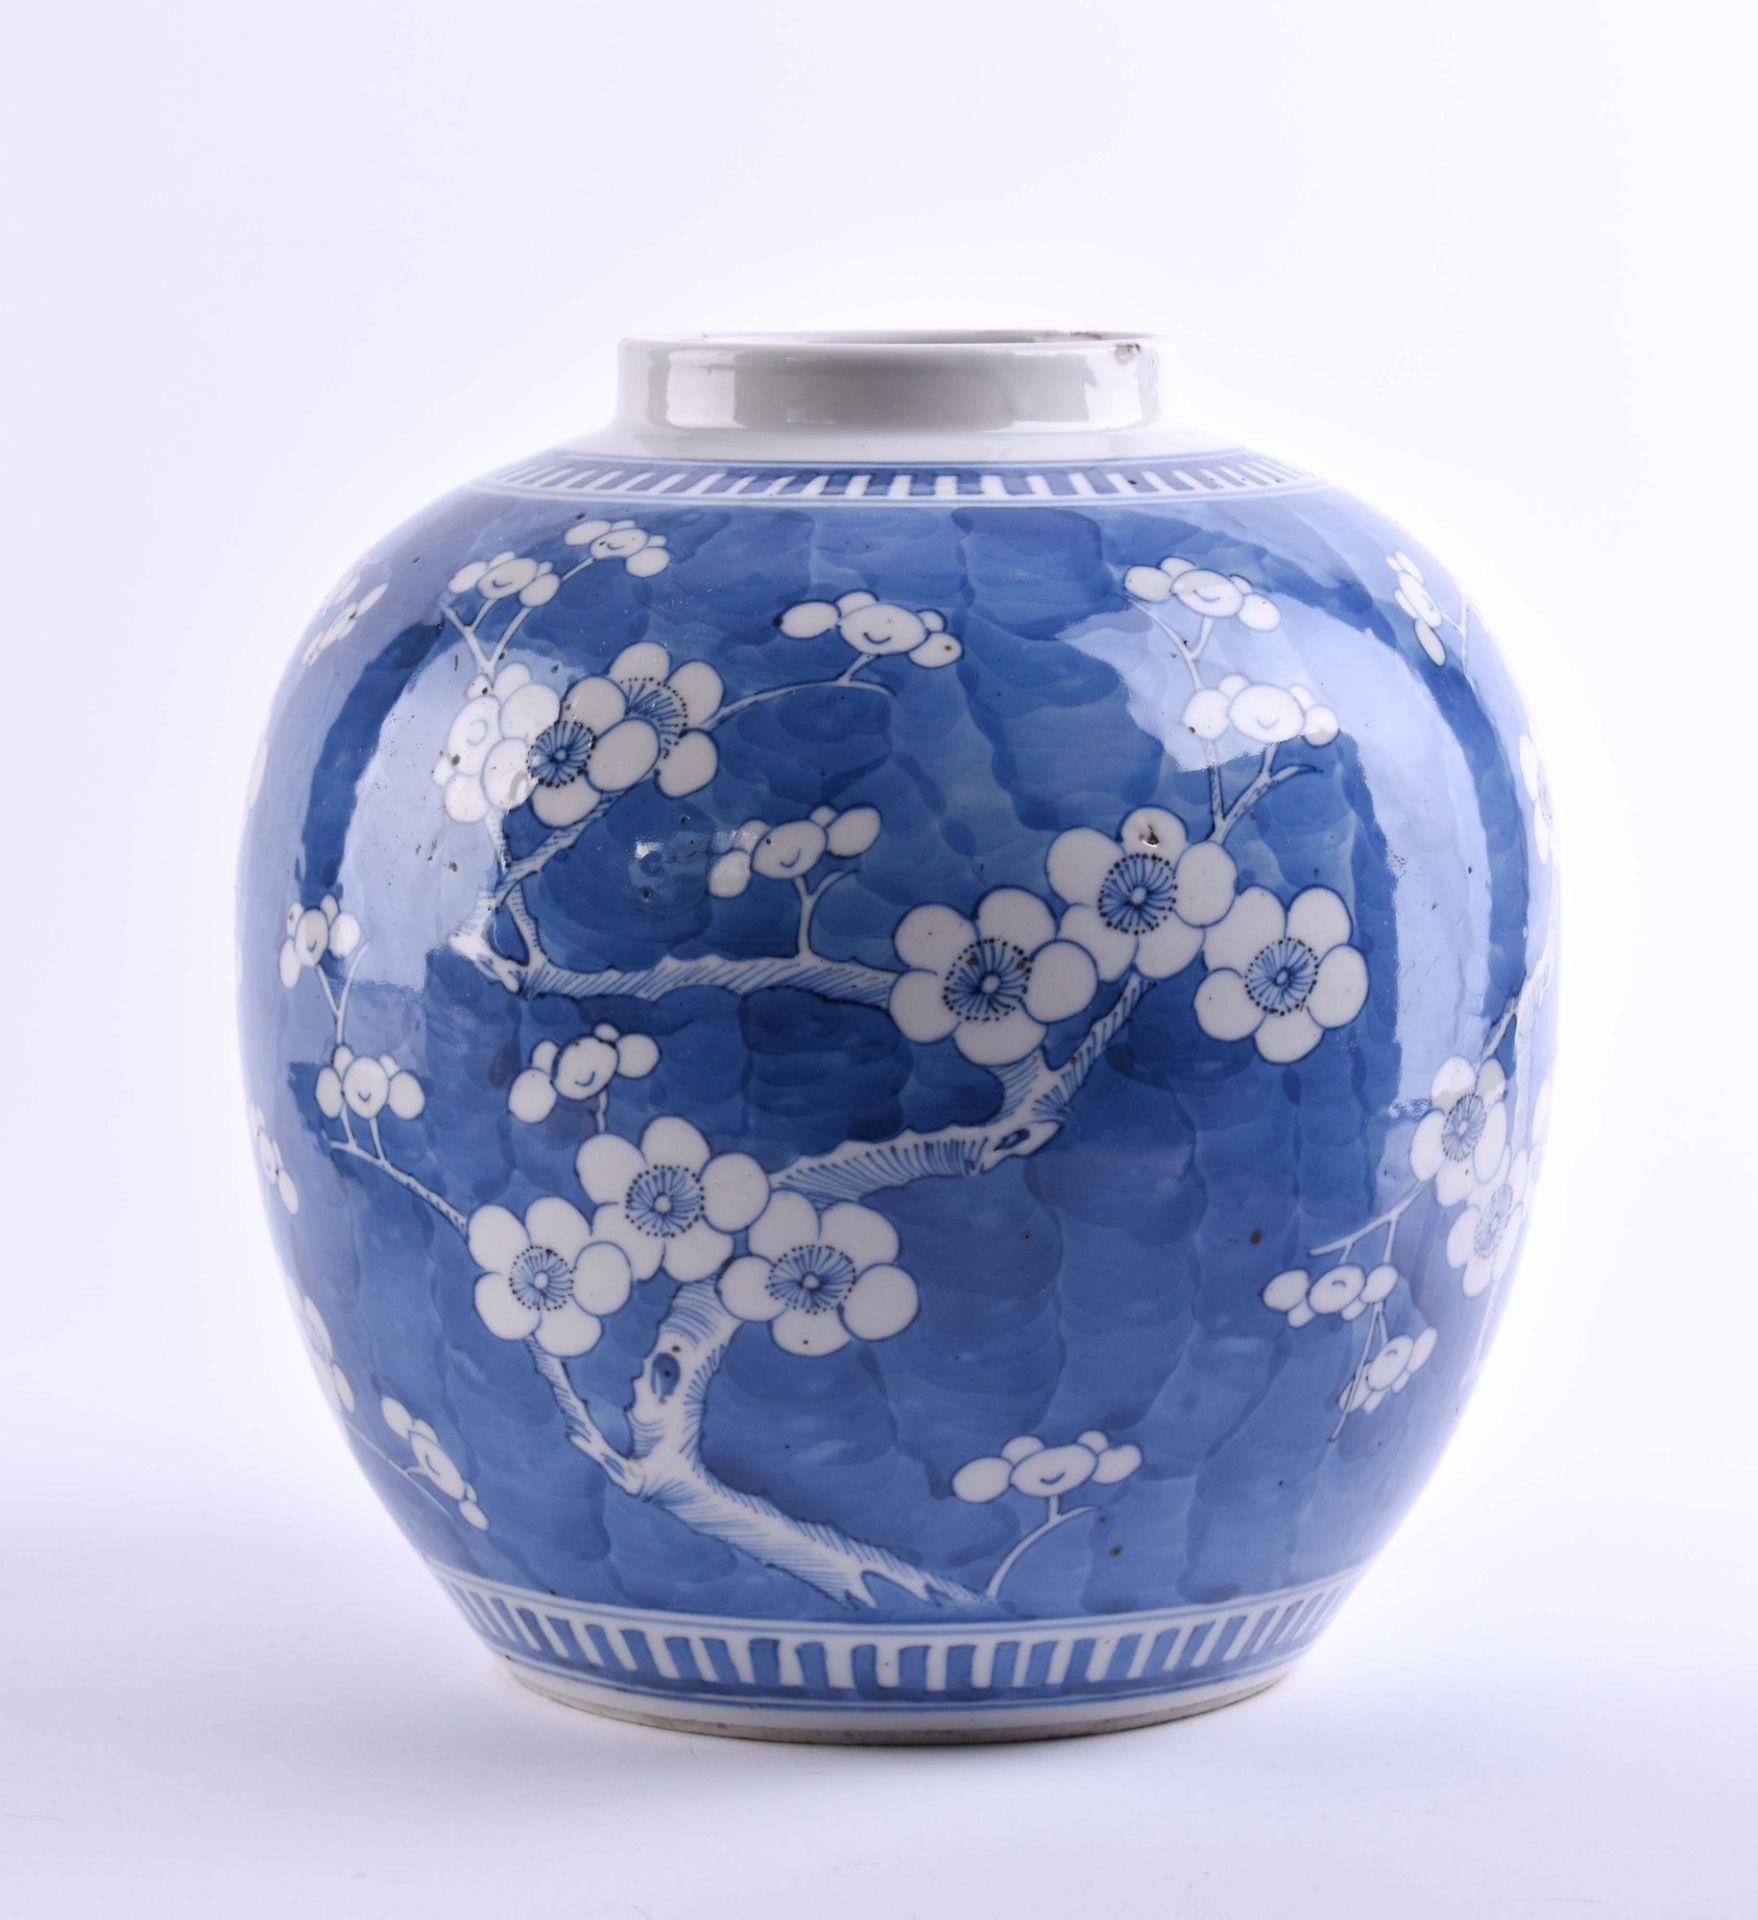 Ginger pot China Qing period - Image 2 of 4